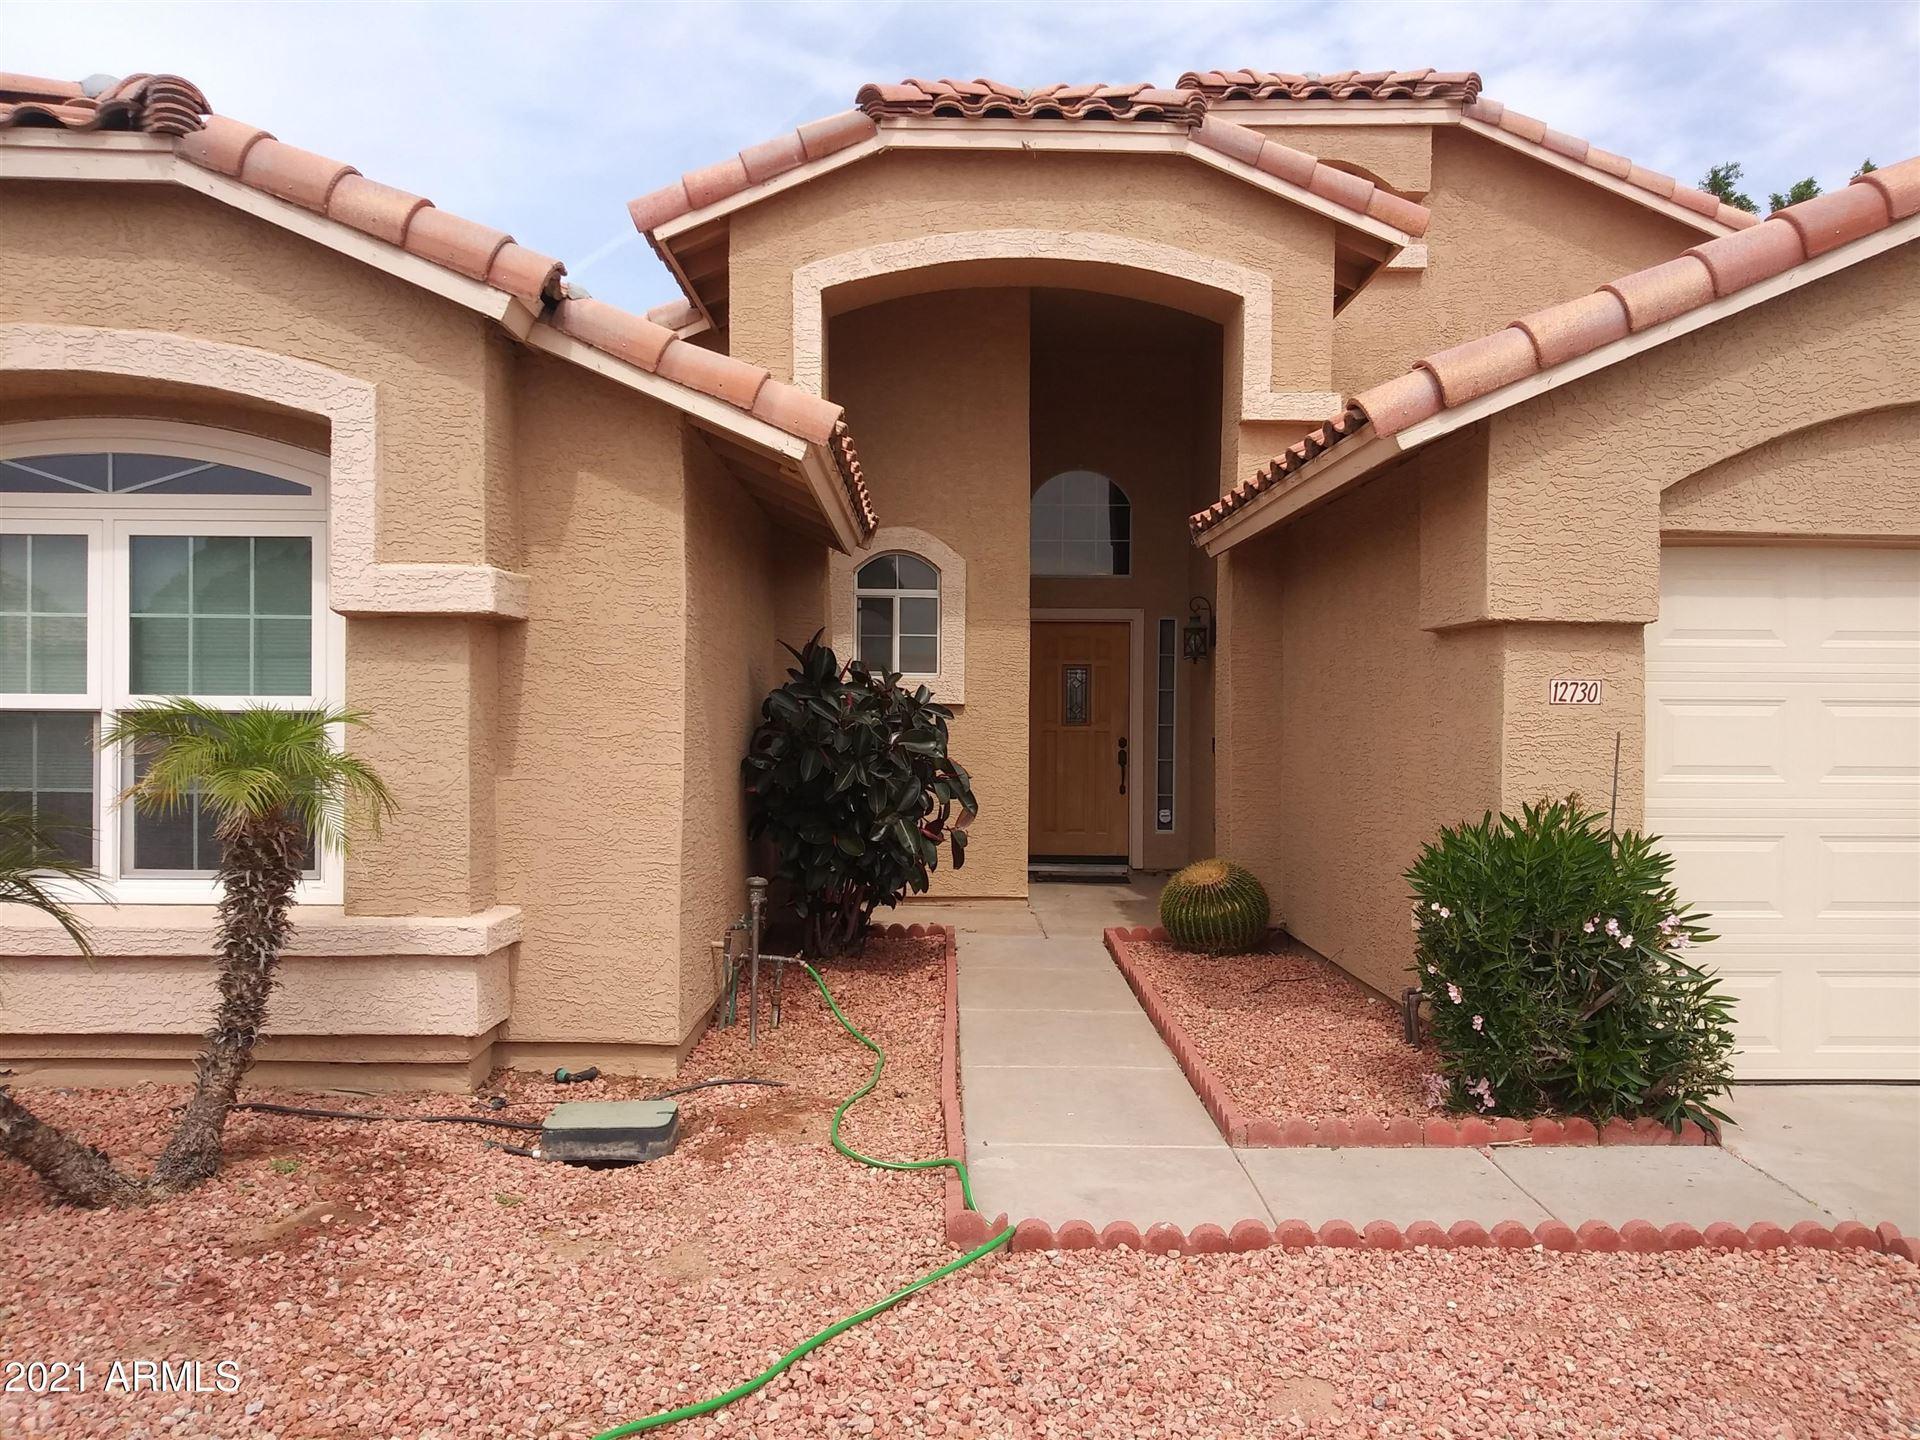 Photo of 12730 W VIRGINIA Avenue, Avondale, AZ 85392 (MLS # 6230347)